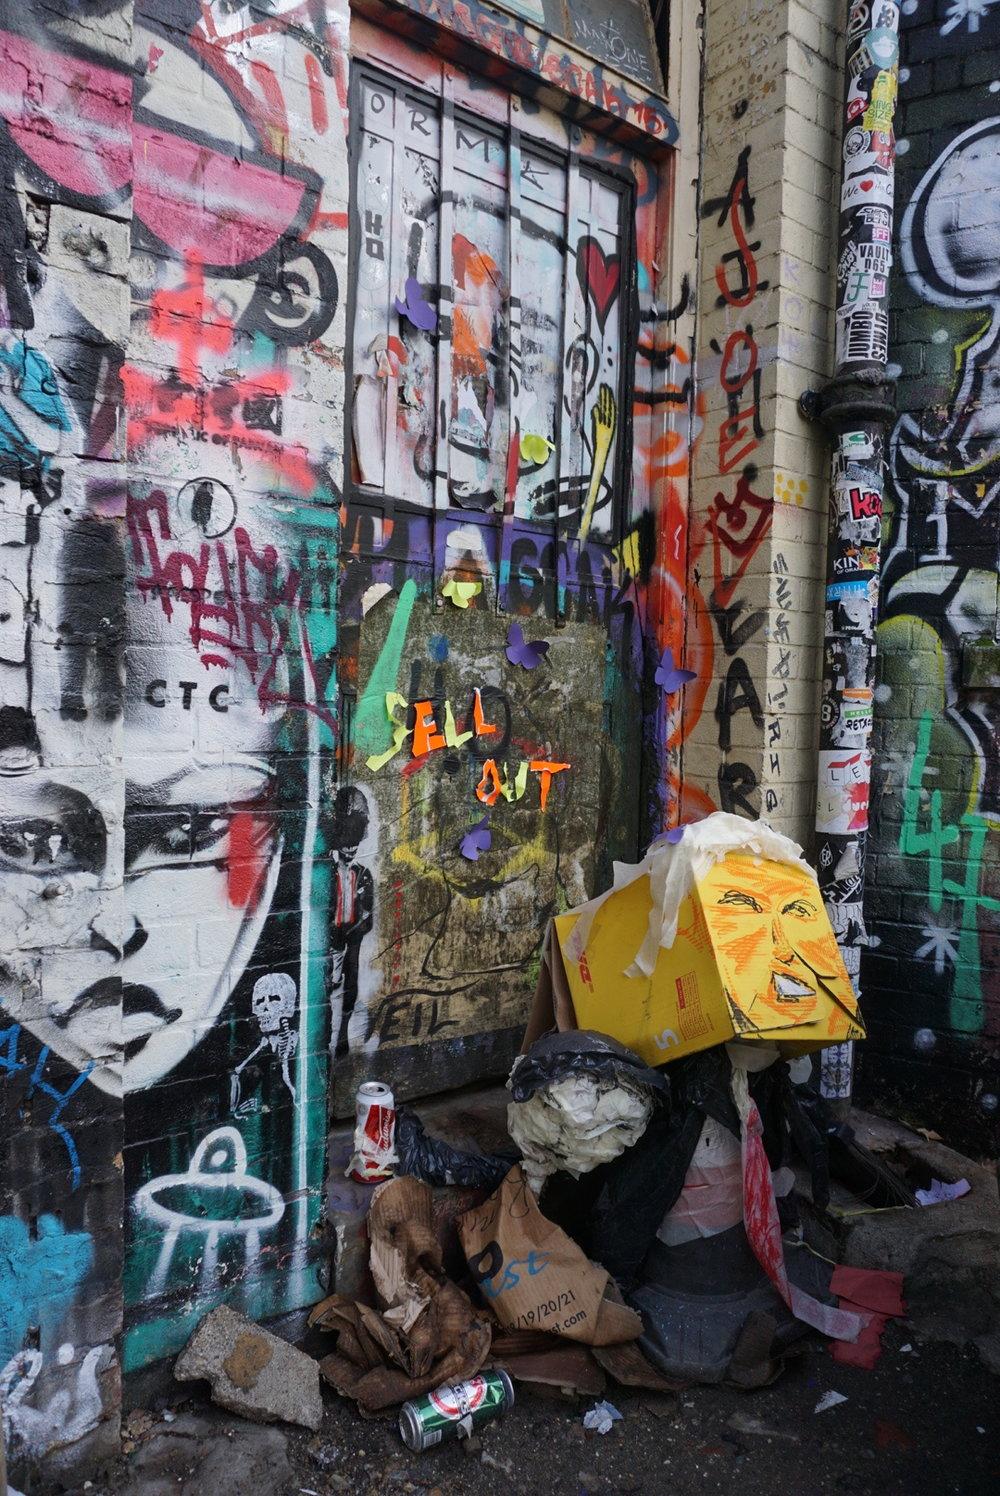 Sell Out Trash sculpture  & Graffiti